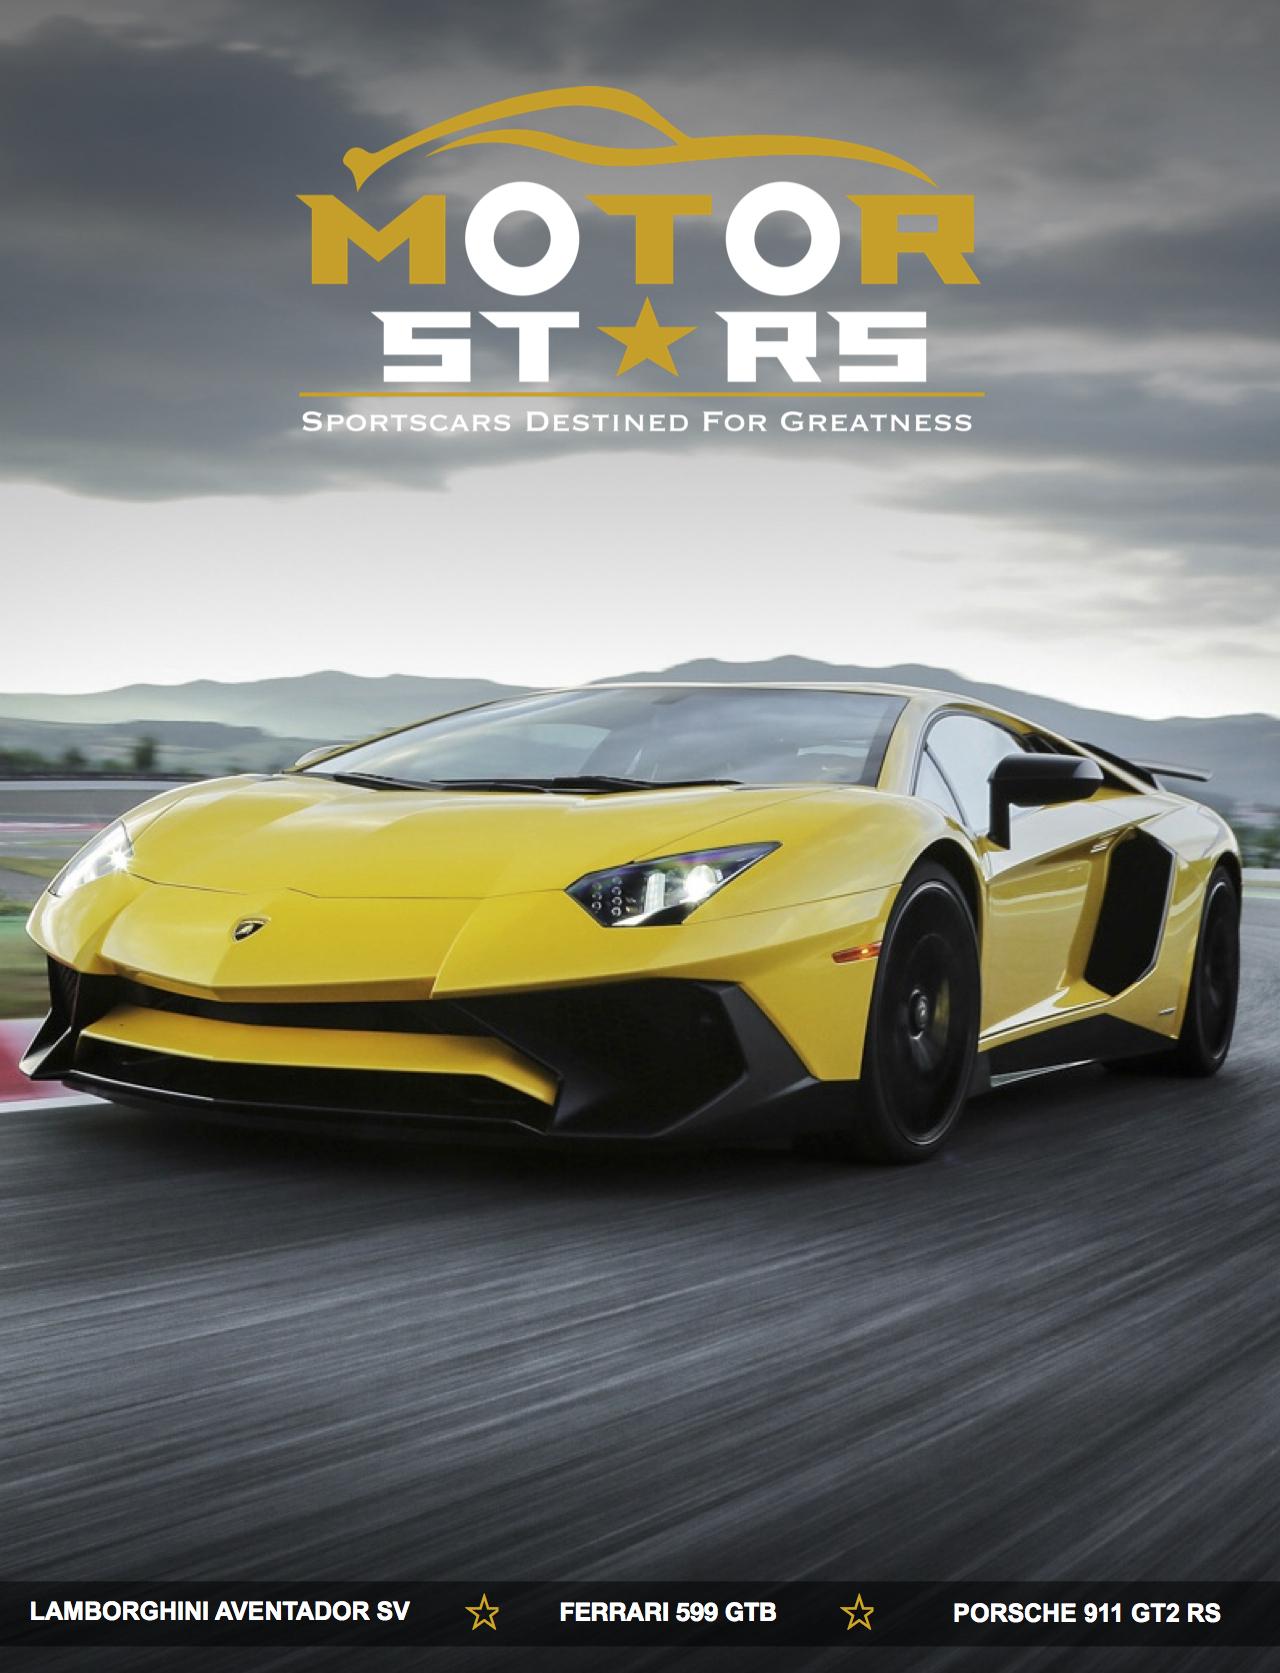 MotorStars-Issue-Twenty-Nine-Front-Cover-Lamborghini-Aventador-LP750-4-Superveloce Stunning Porsche 911 Gt2 Rs Vs Lamborghini Aventador Cars Trend